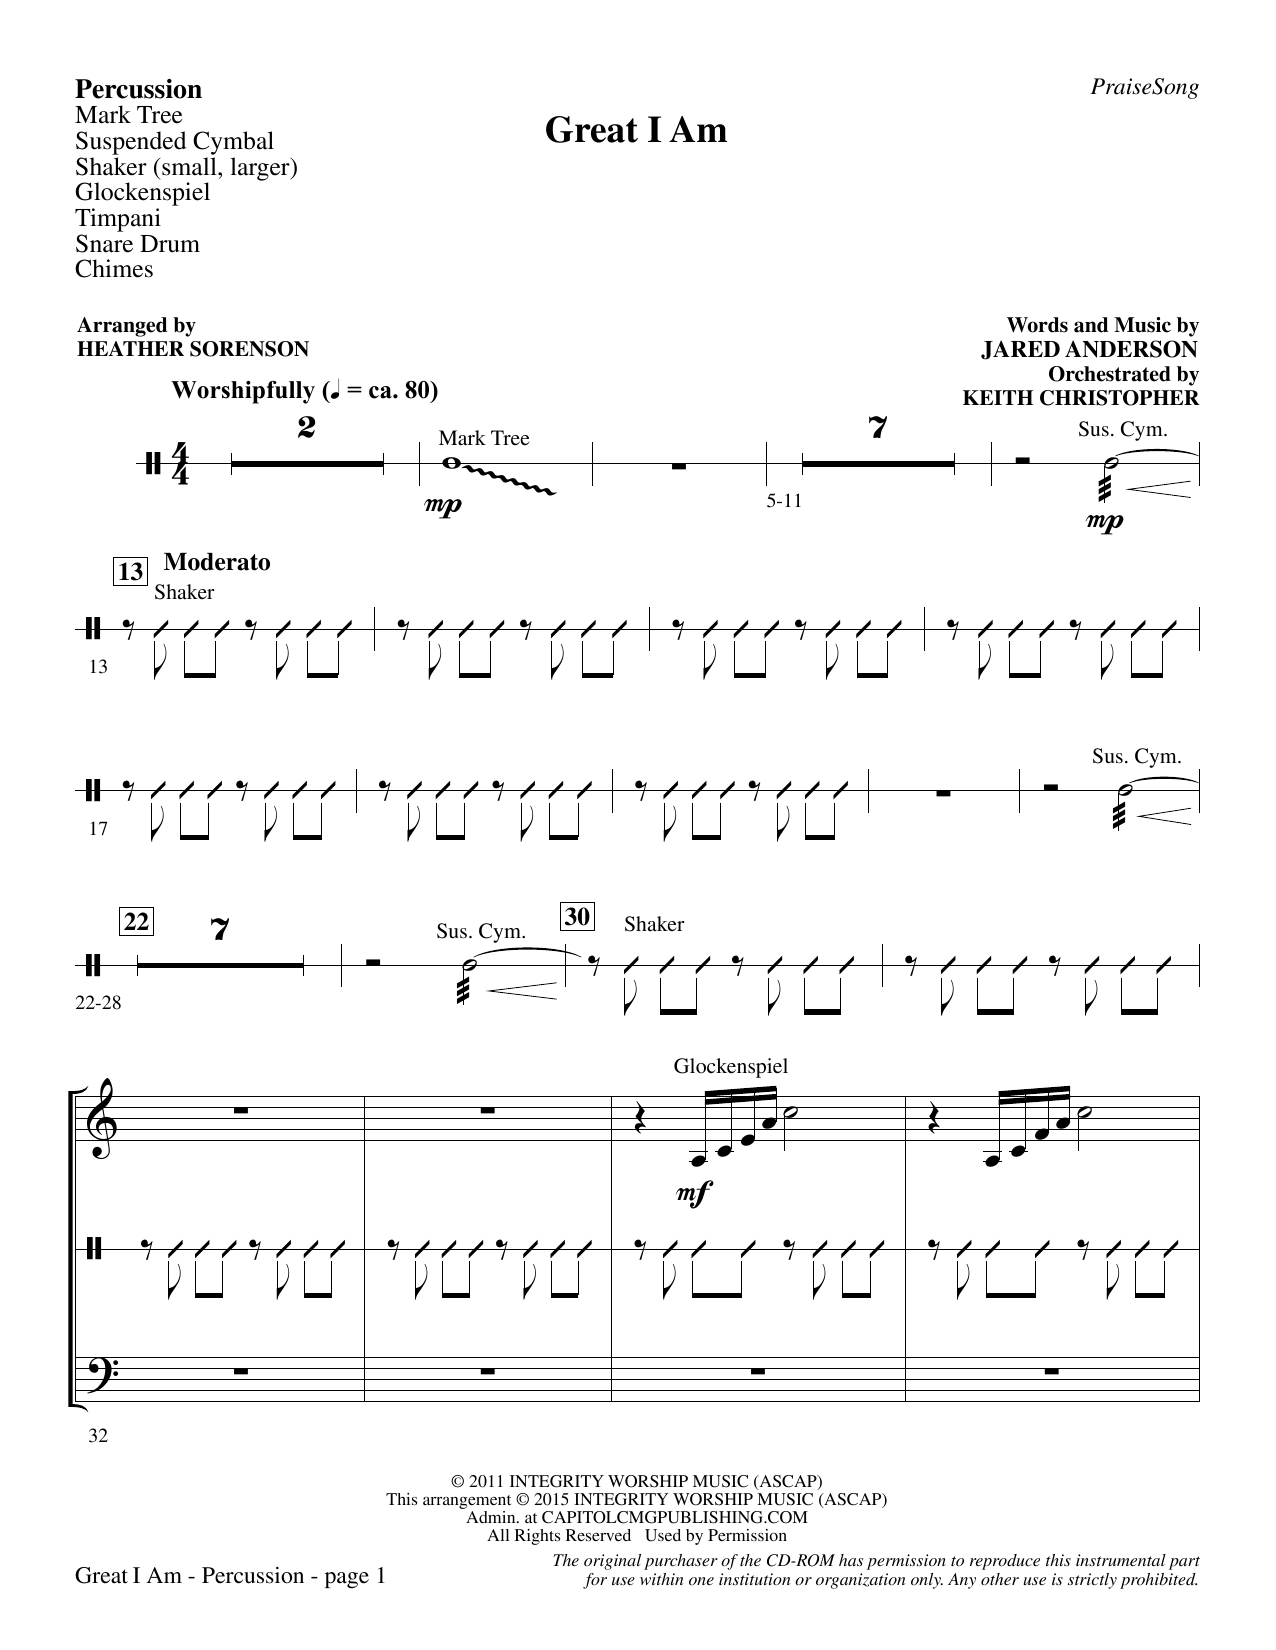 Great I Am - Percussion sheet music